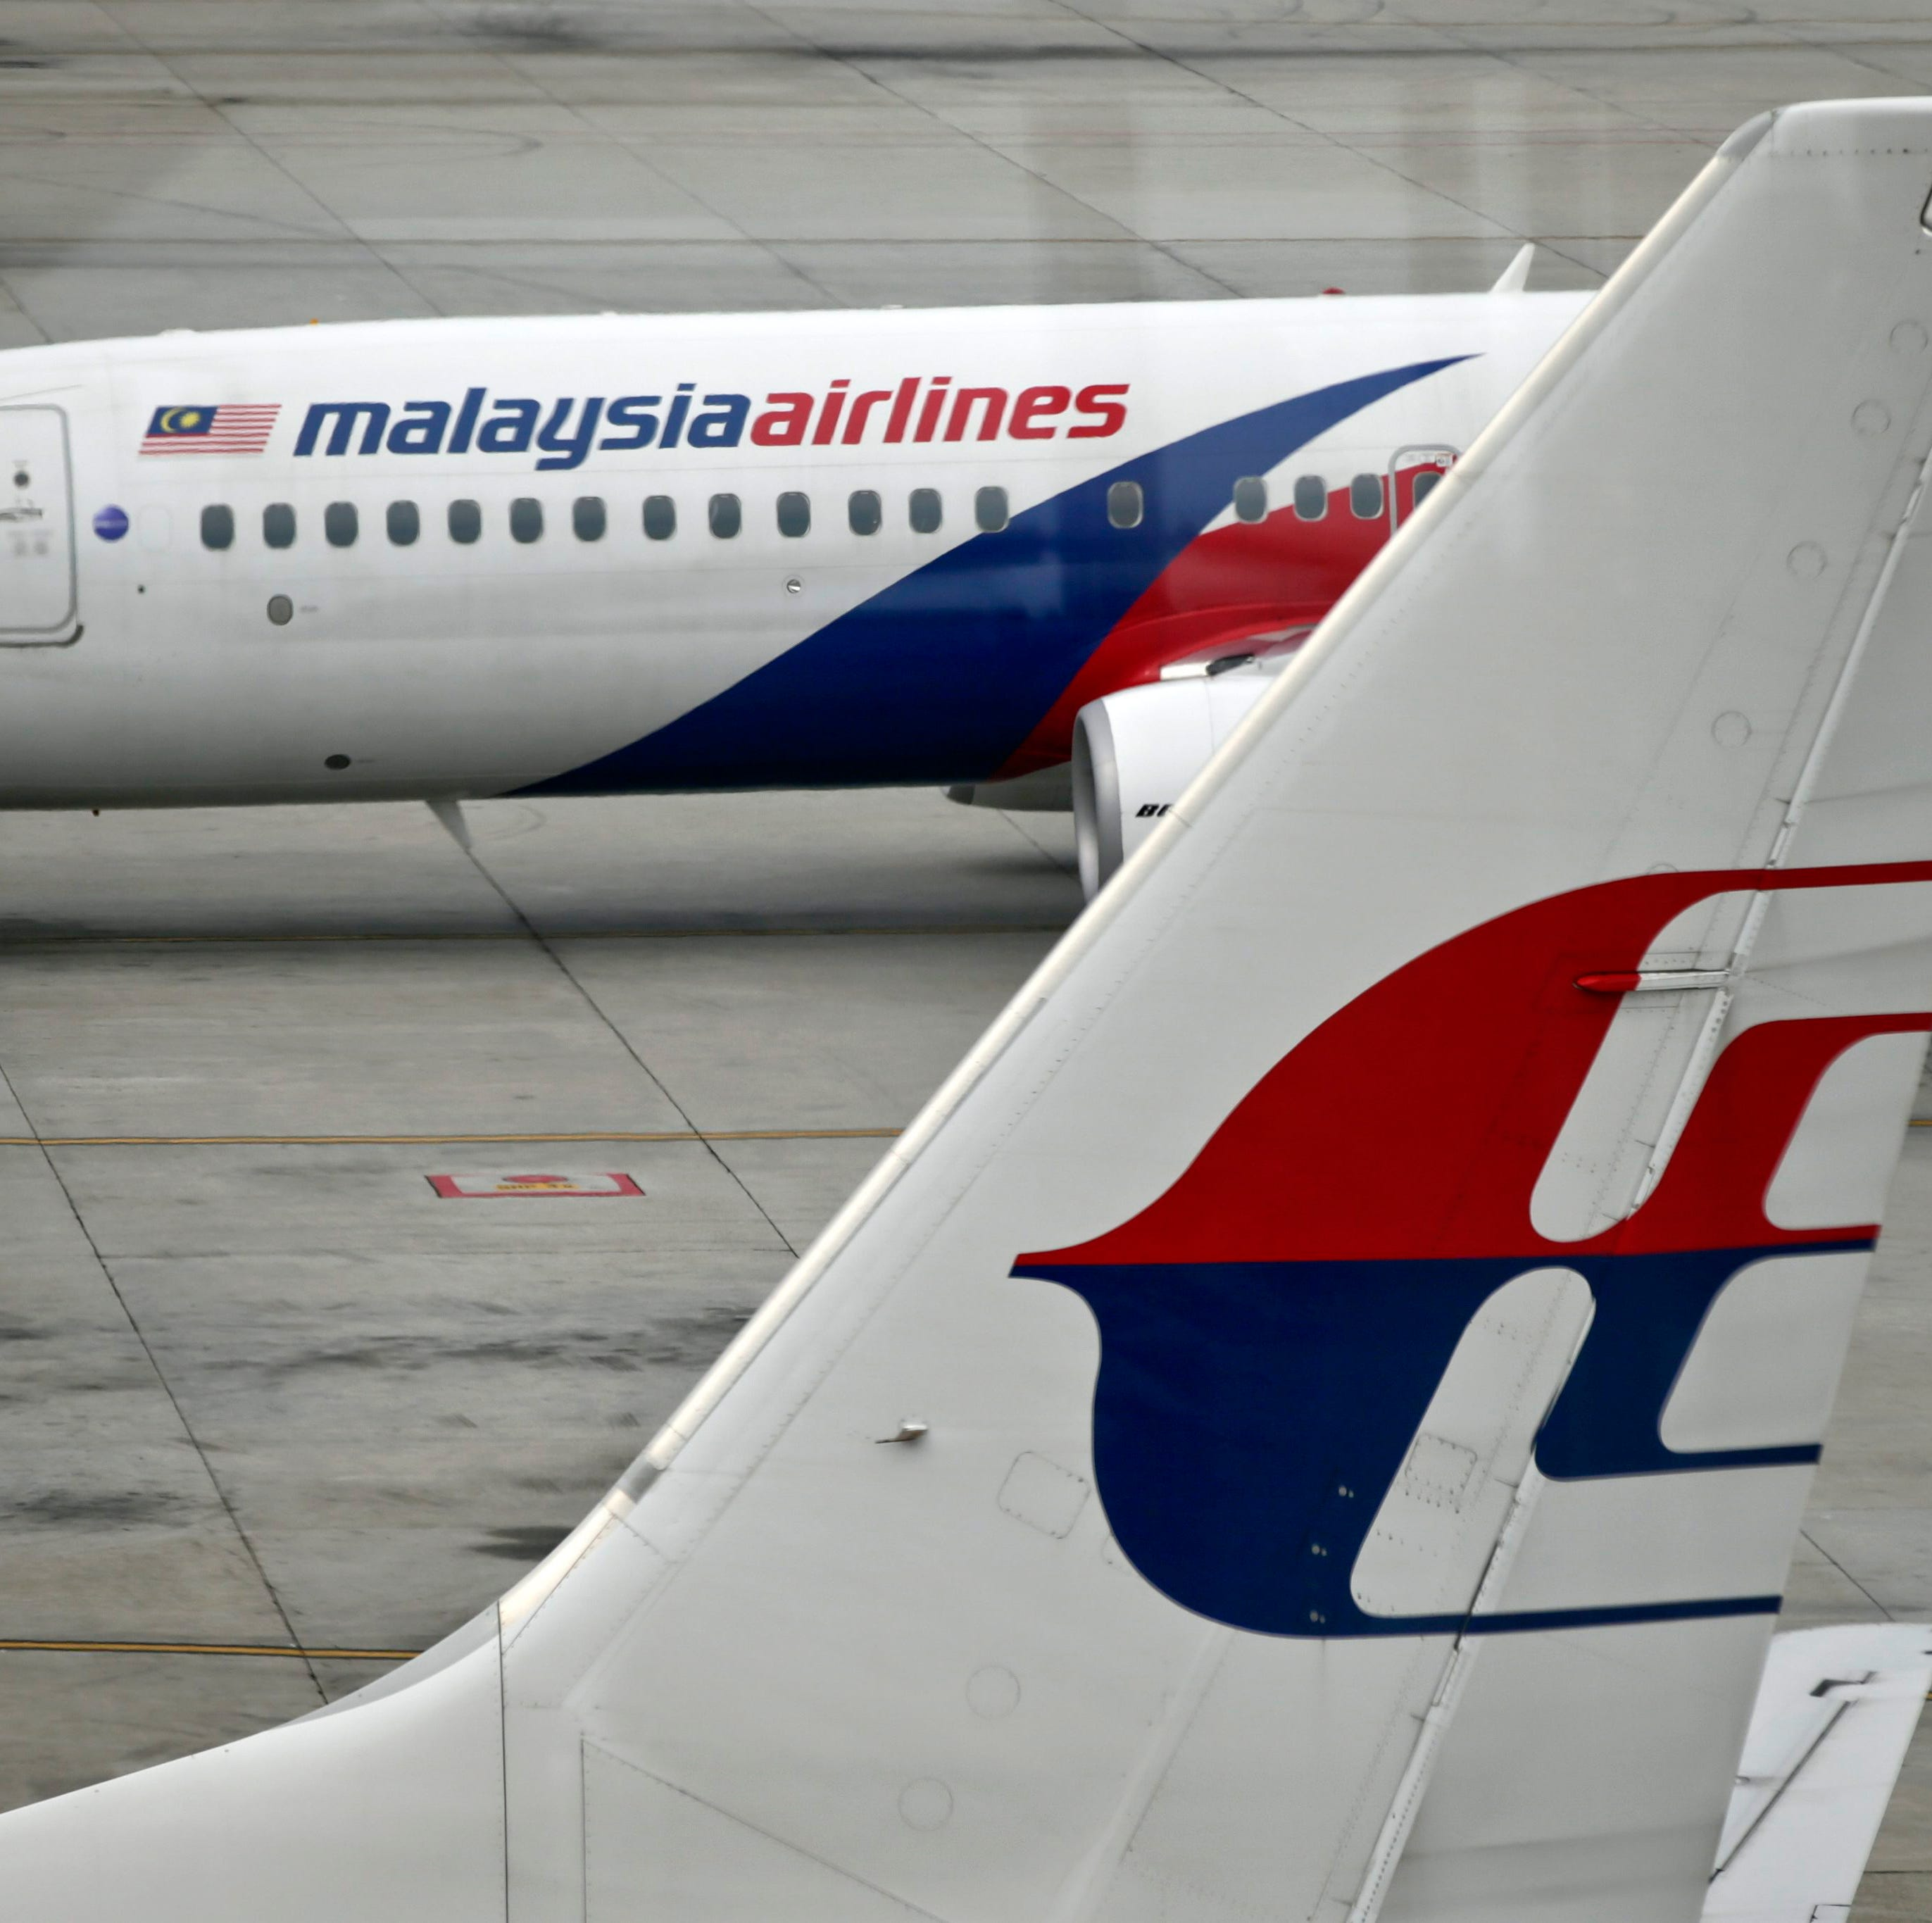 Malaysia Airline aircrafts taxi at the Kuala Lumpur International Airport (KLIA) in Sepang outside Kuala Lumpur, Malaysia, July 20, 2015.